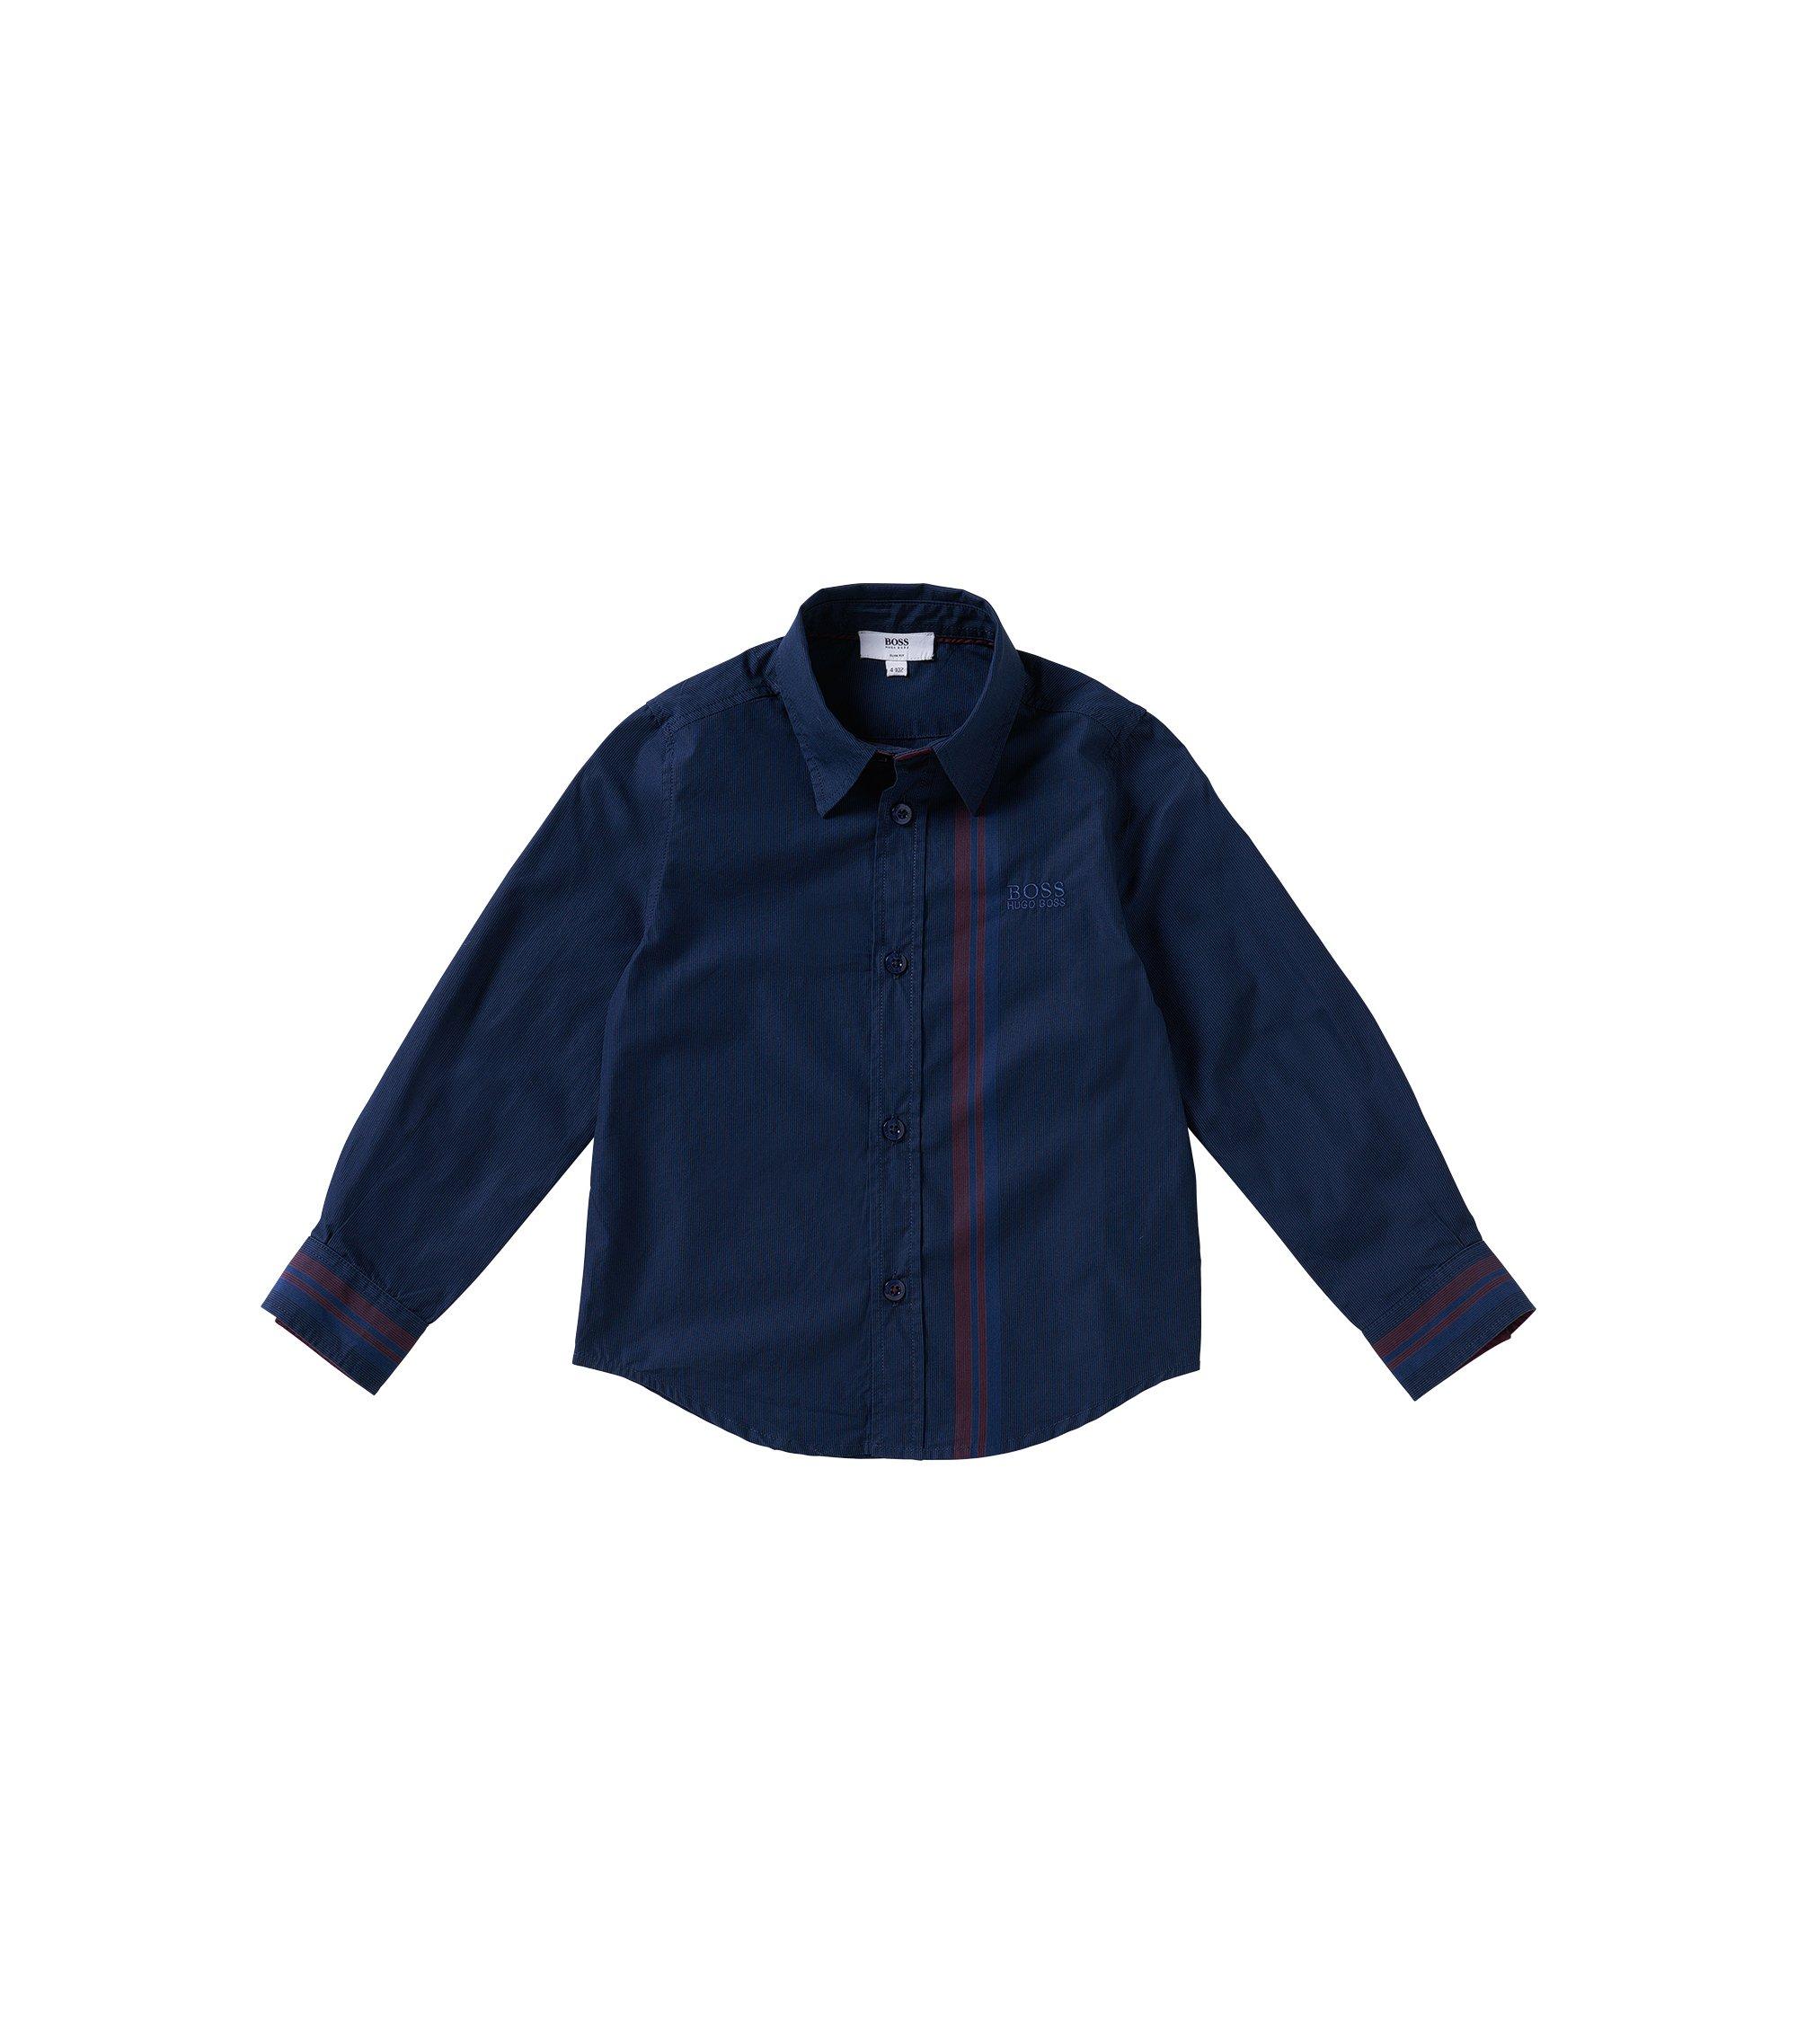 Kids-Hemd aus Baumwolle: 'J25868', Dunkelblau